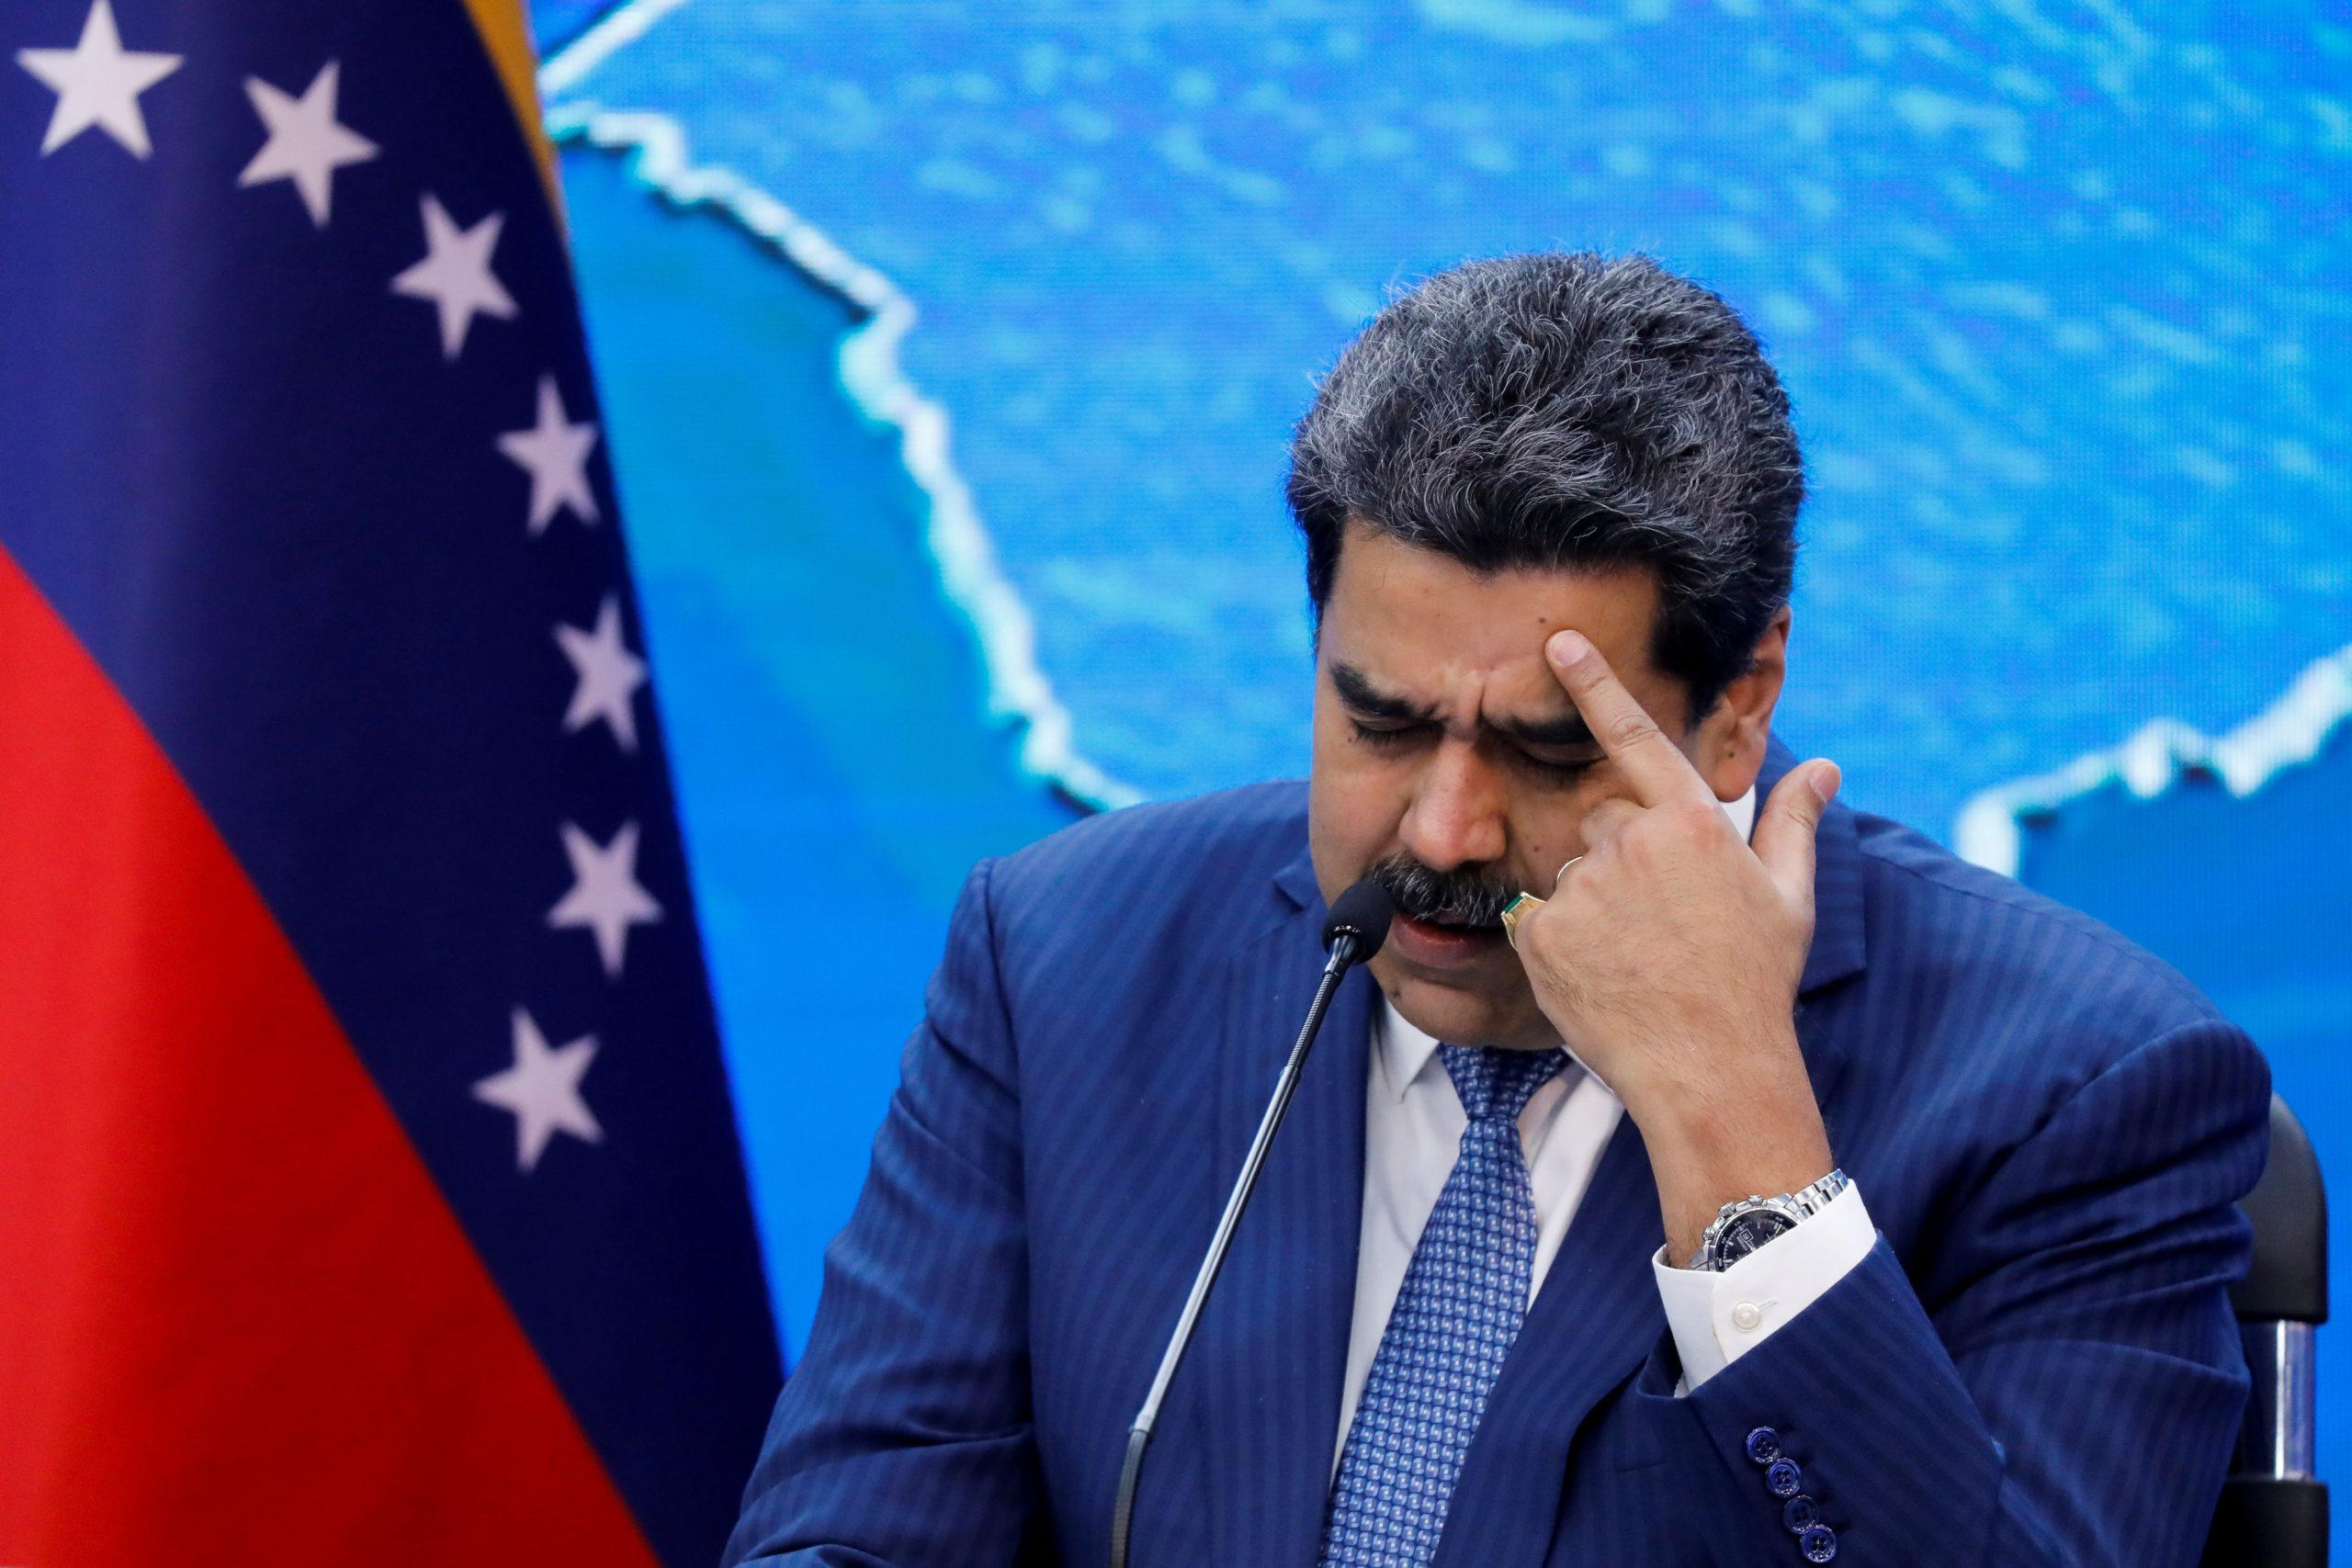 The UN describes the Venezuelan judicial system as a piece of repression of the Maduro government